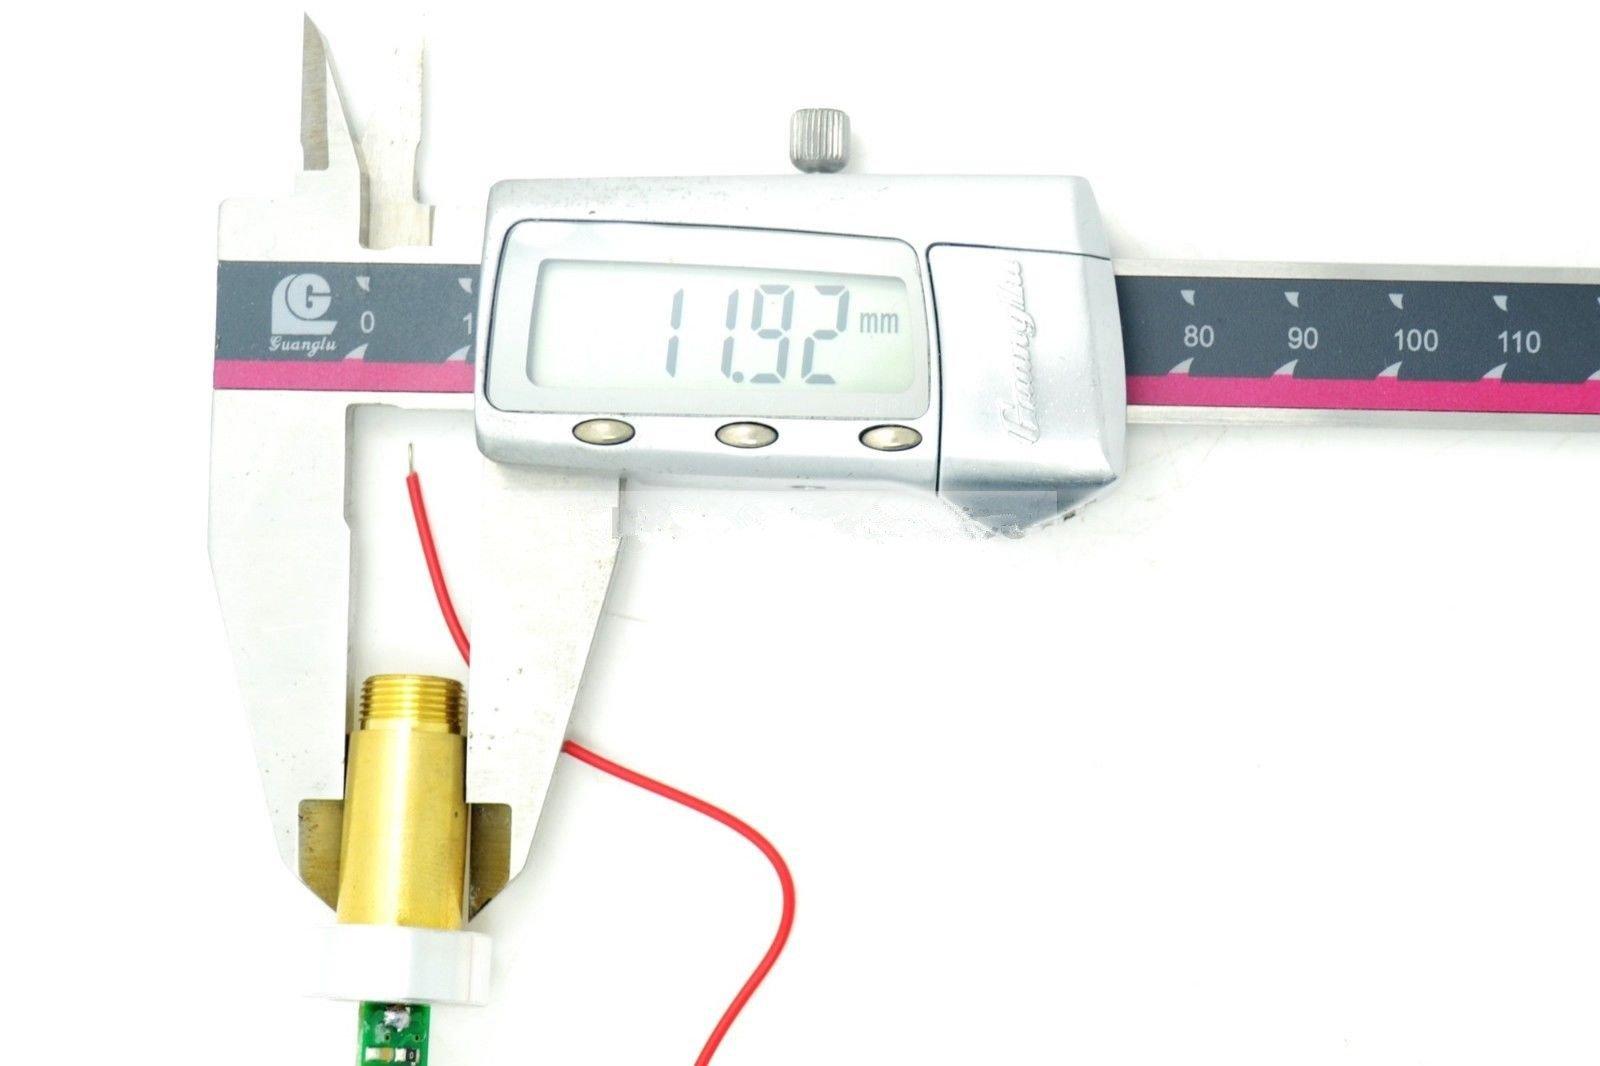 532nm 200mW Green Laser Diode Module 3.7v-4.2v w/ Heatsink by sunshine-electronics (Image #5)